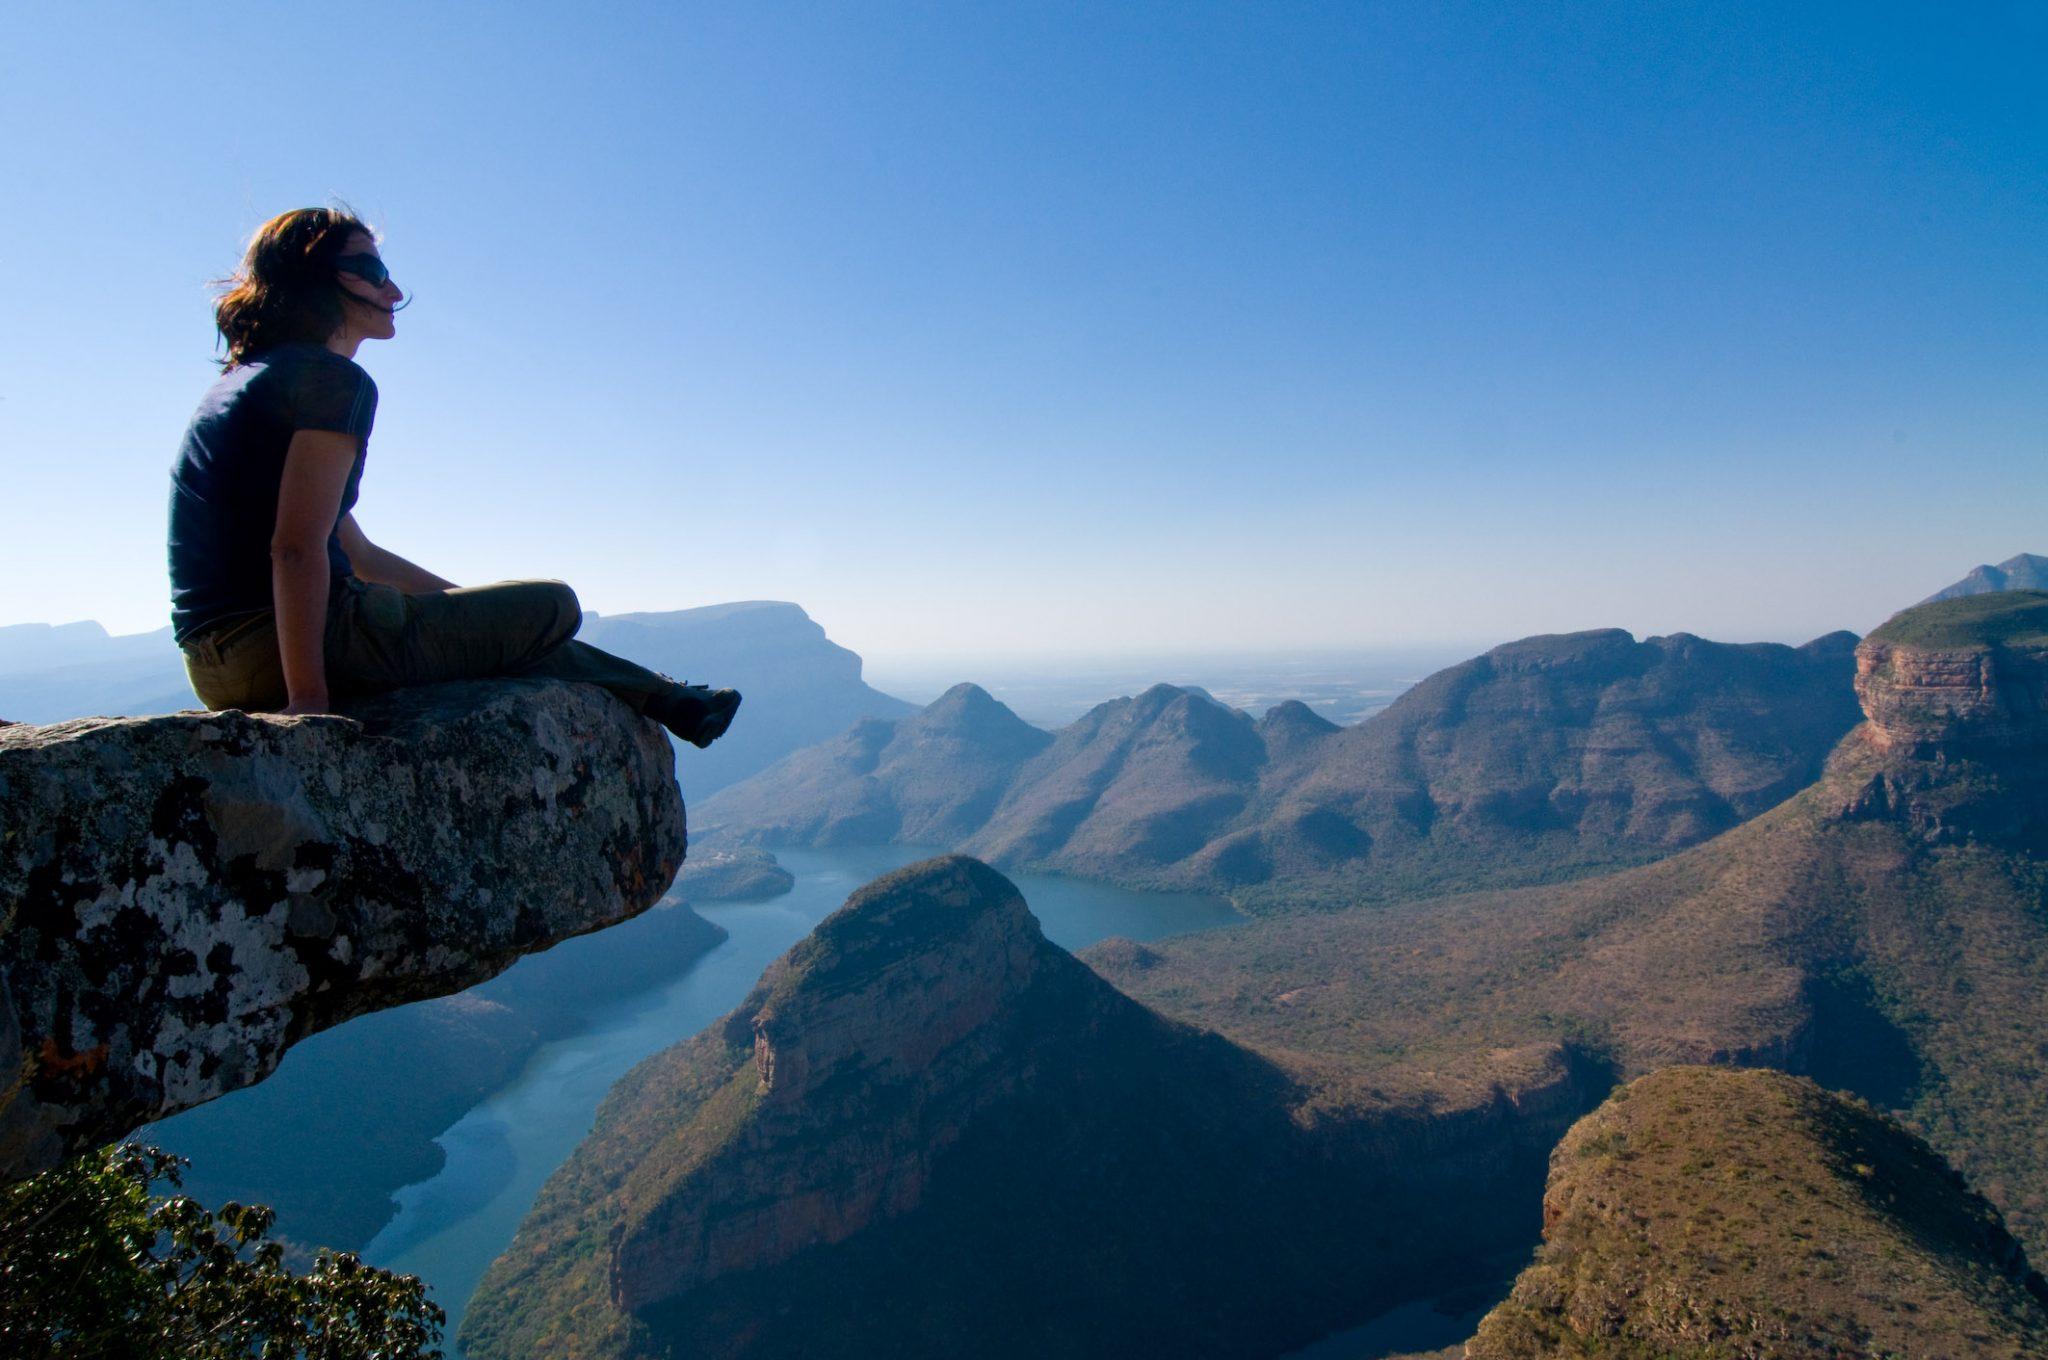 Blyde River Canyon von oben, © Dirk Bleyer